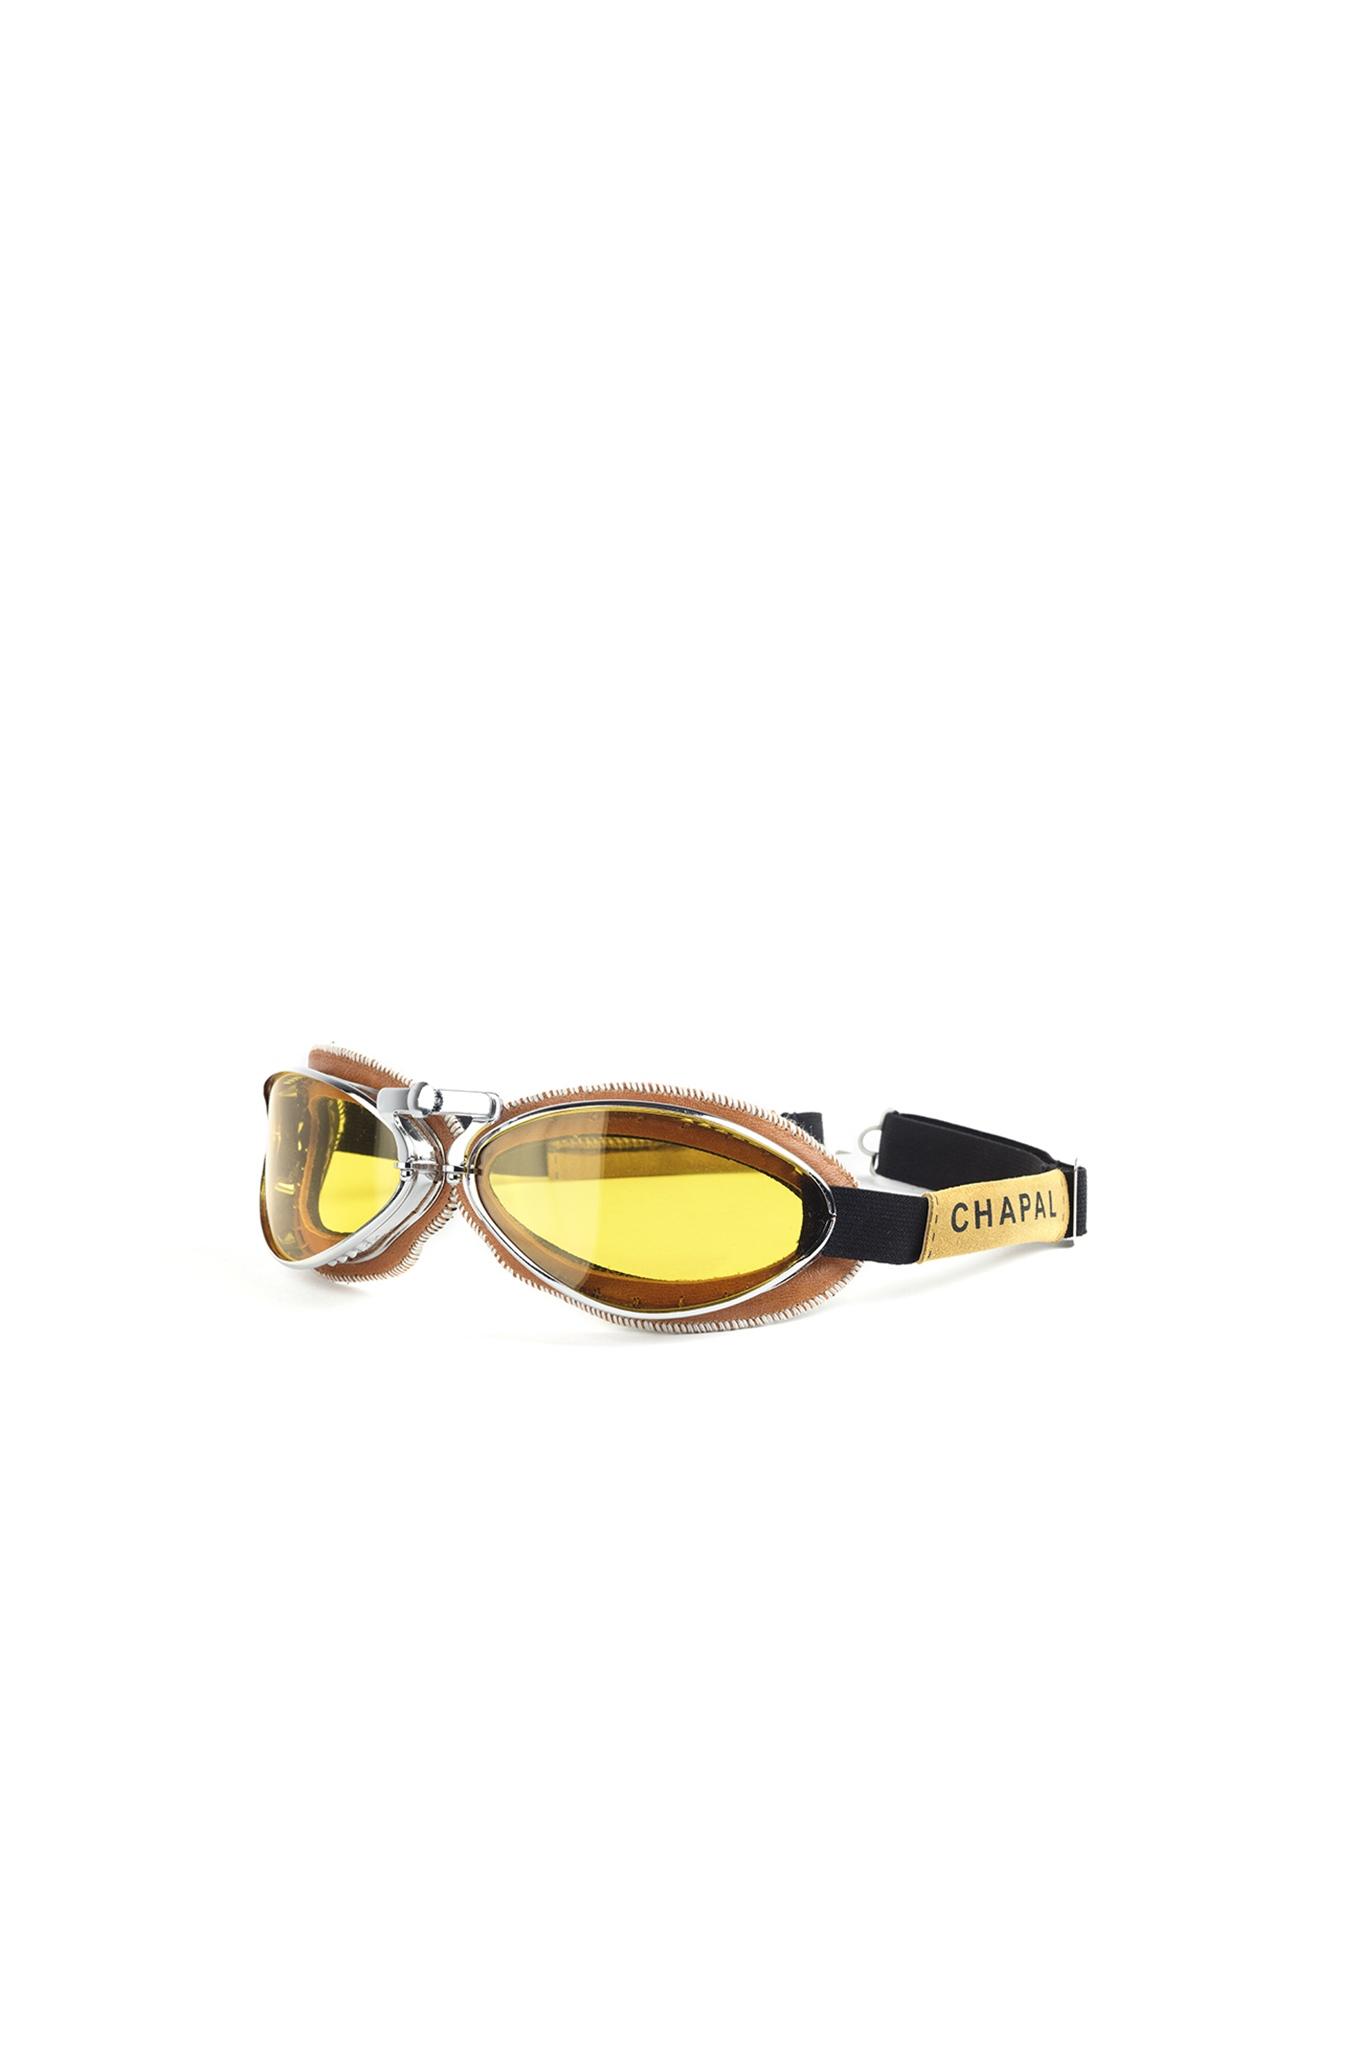 Retro Goggles - Aluminium and glossy leather - Tan color